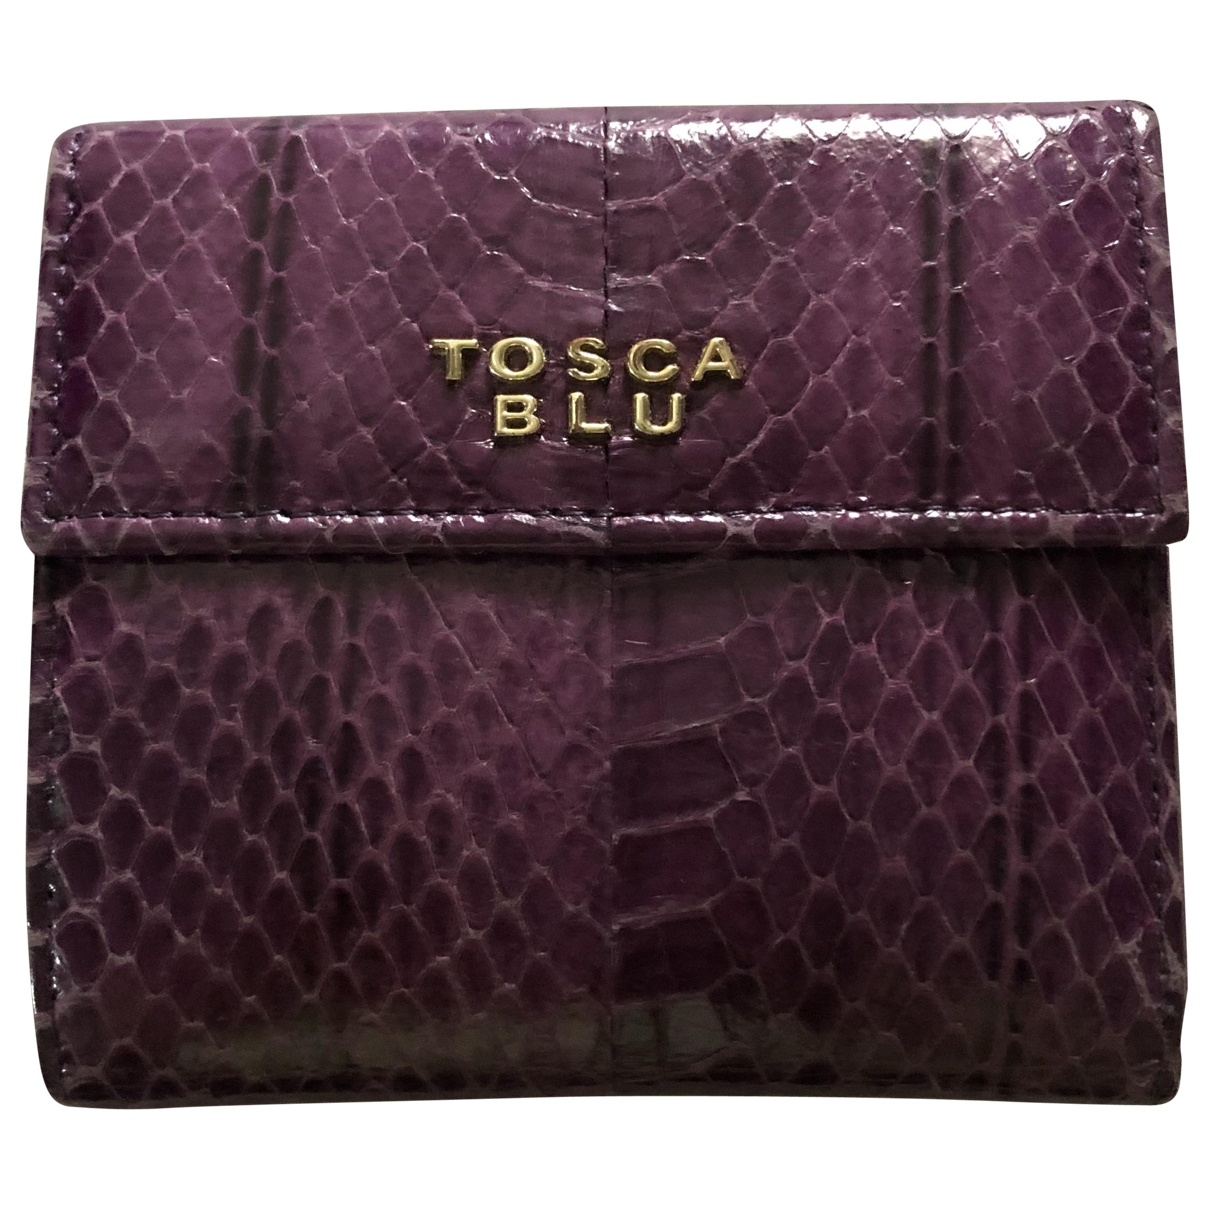 Tosca Blu \N Portemonnaie in  Lila Python